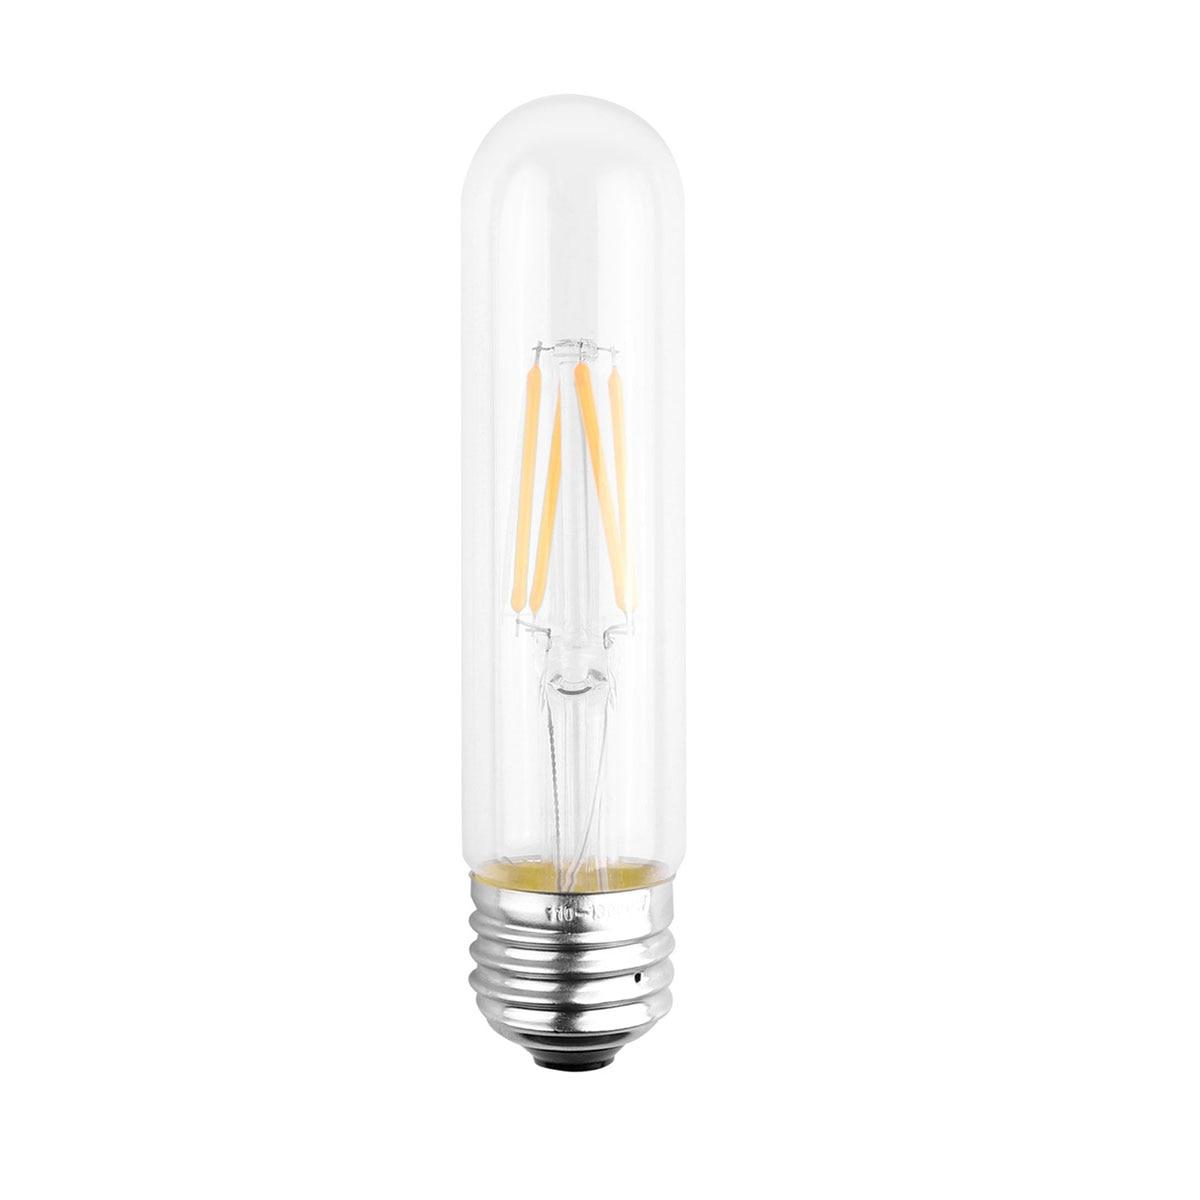 4w Vintage Edison T30 Cob Led Filament Light For Home